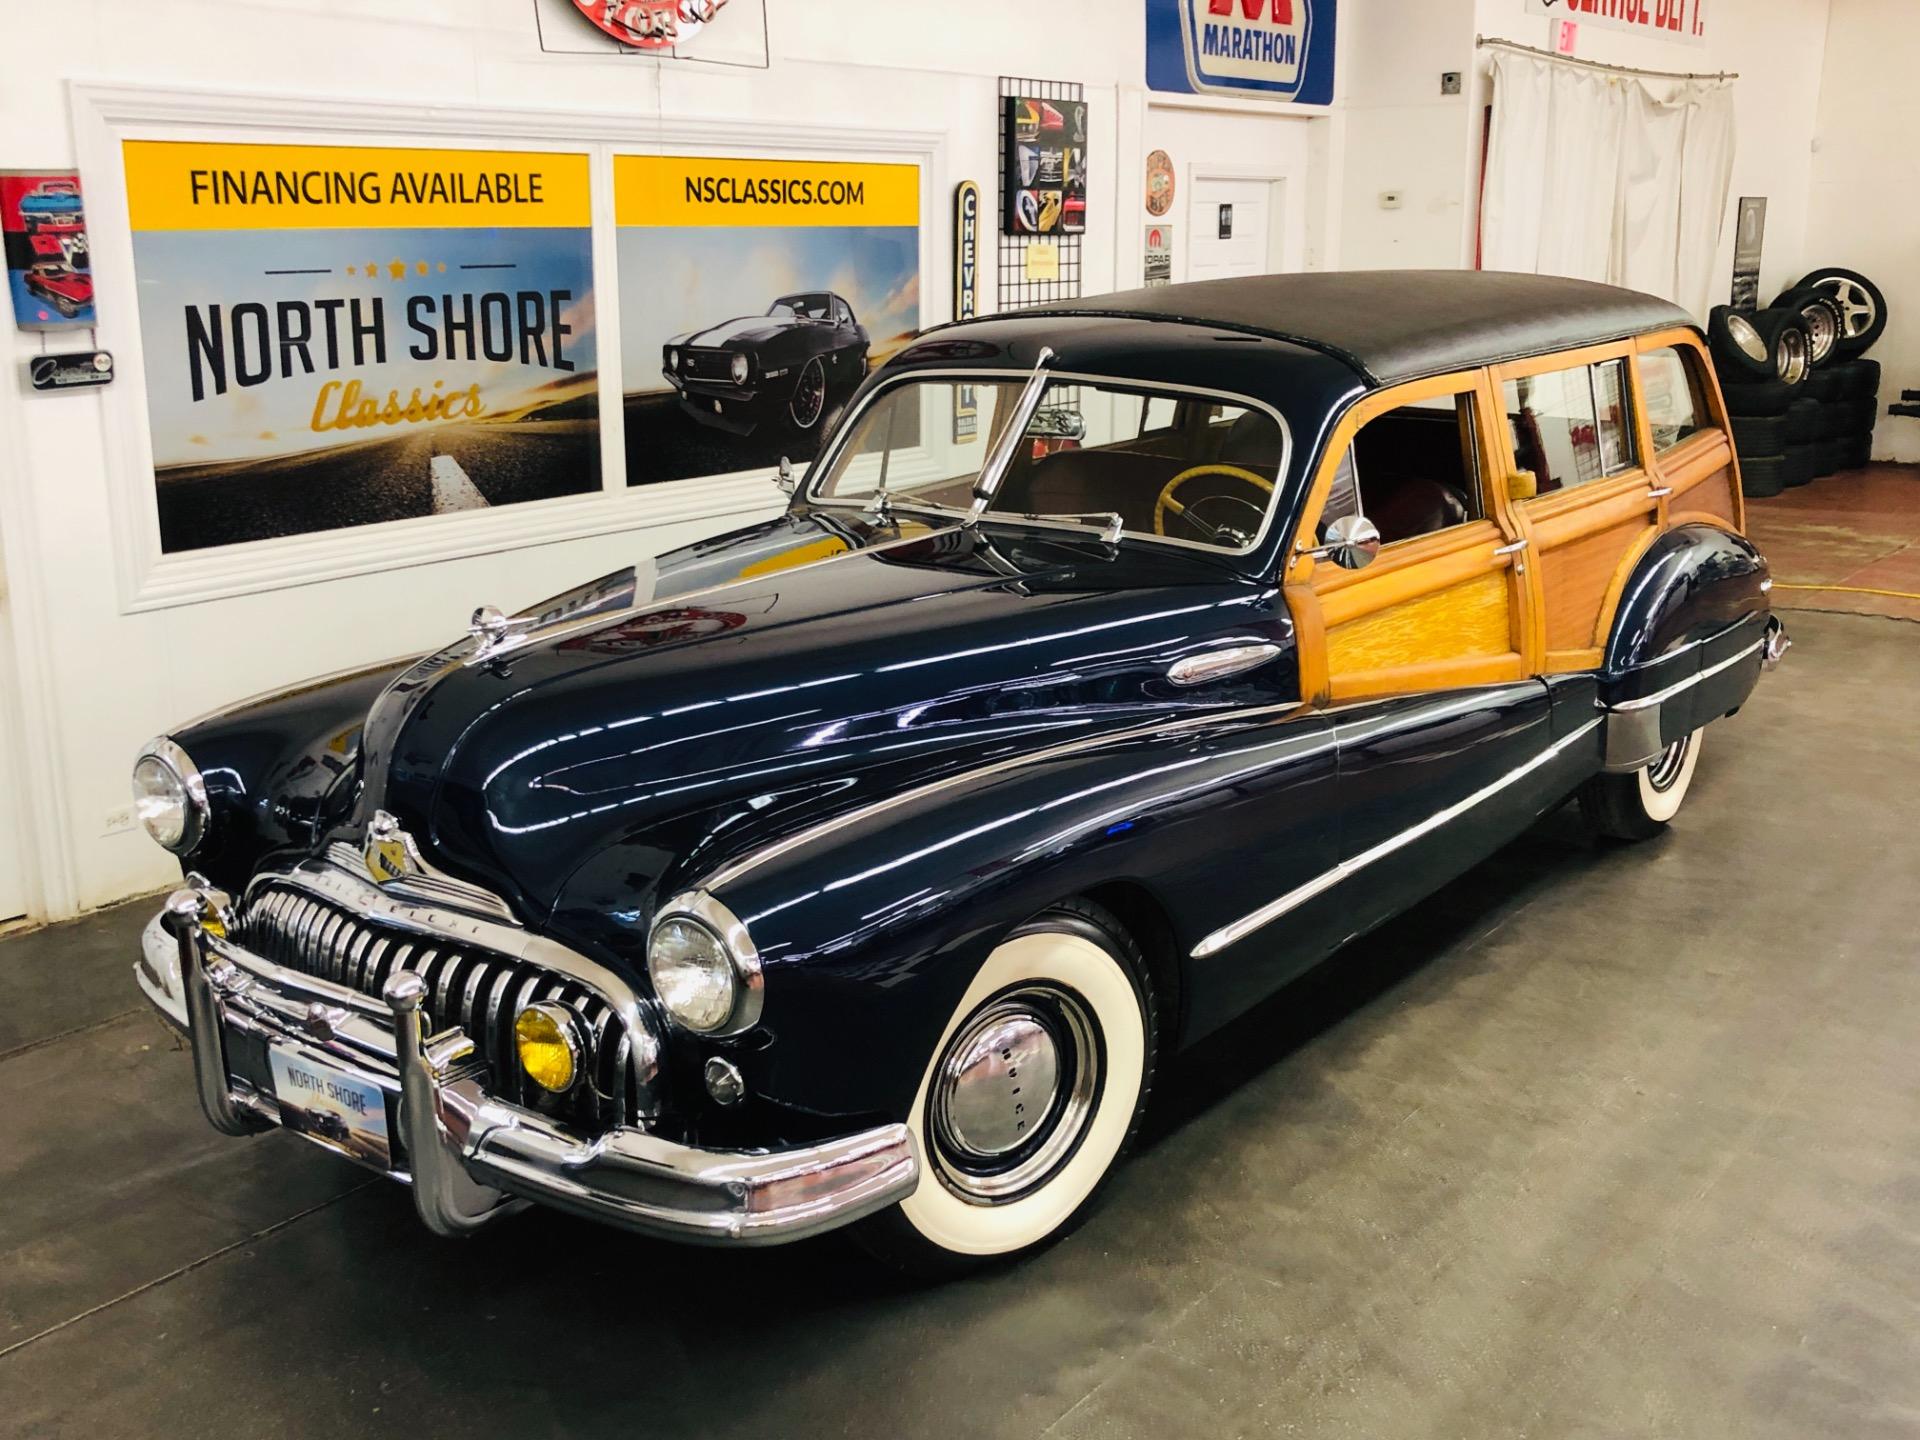 Photo 1947 Buick Roadmaster -ESTATE WAGON - SUPER RARE WOODY - MECHANICALLY SOUND - FIREBALL 8 ENGINE